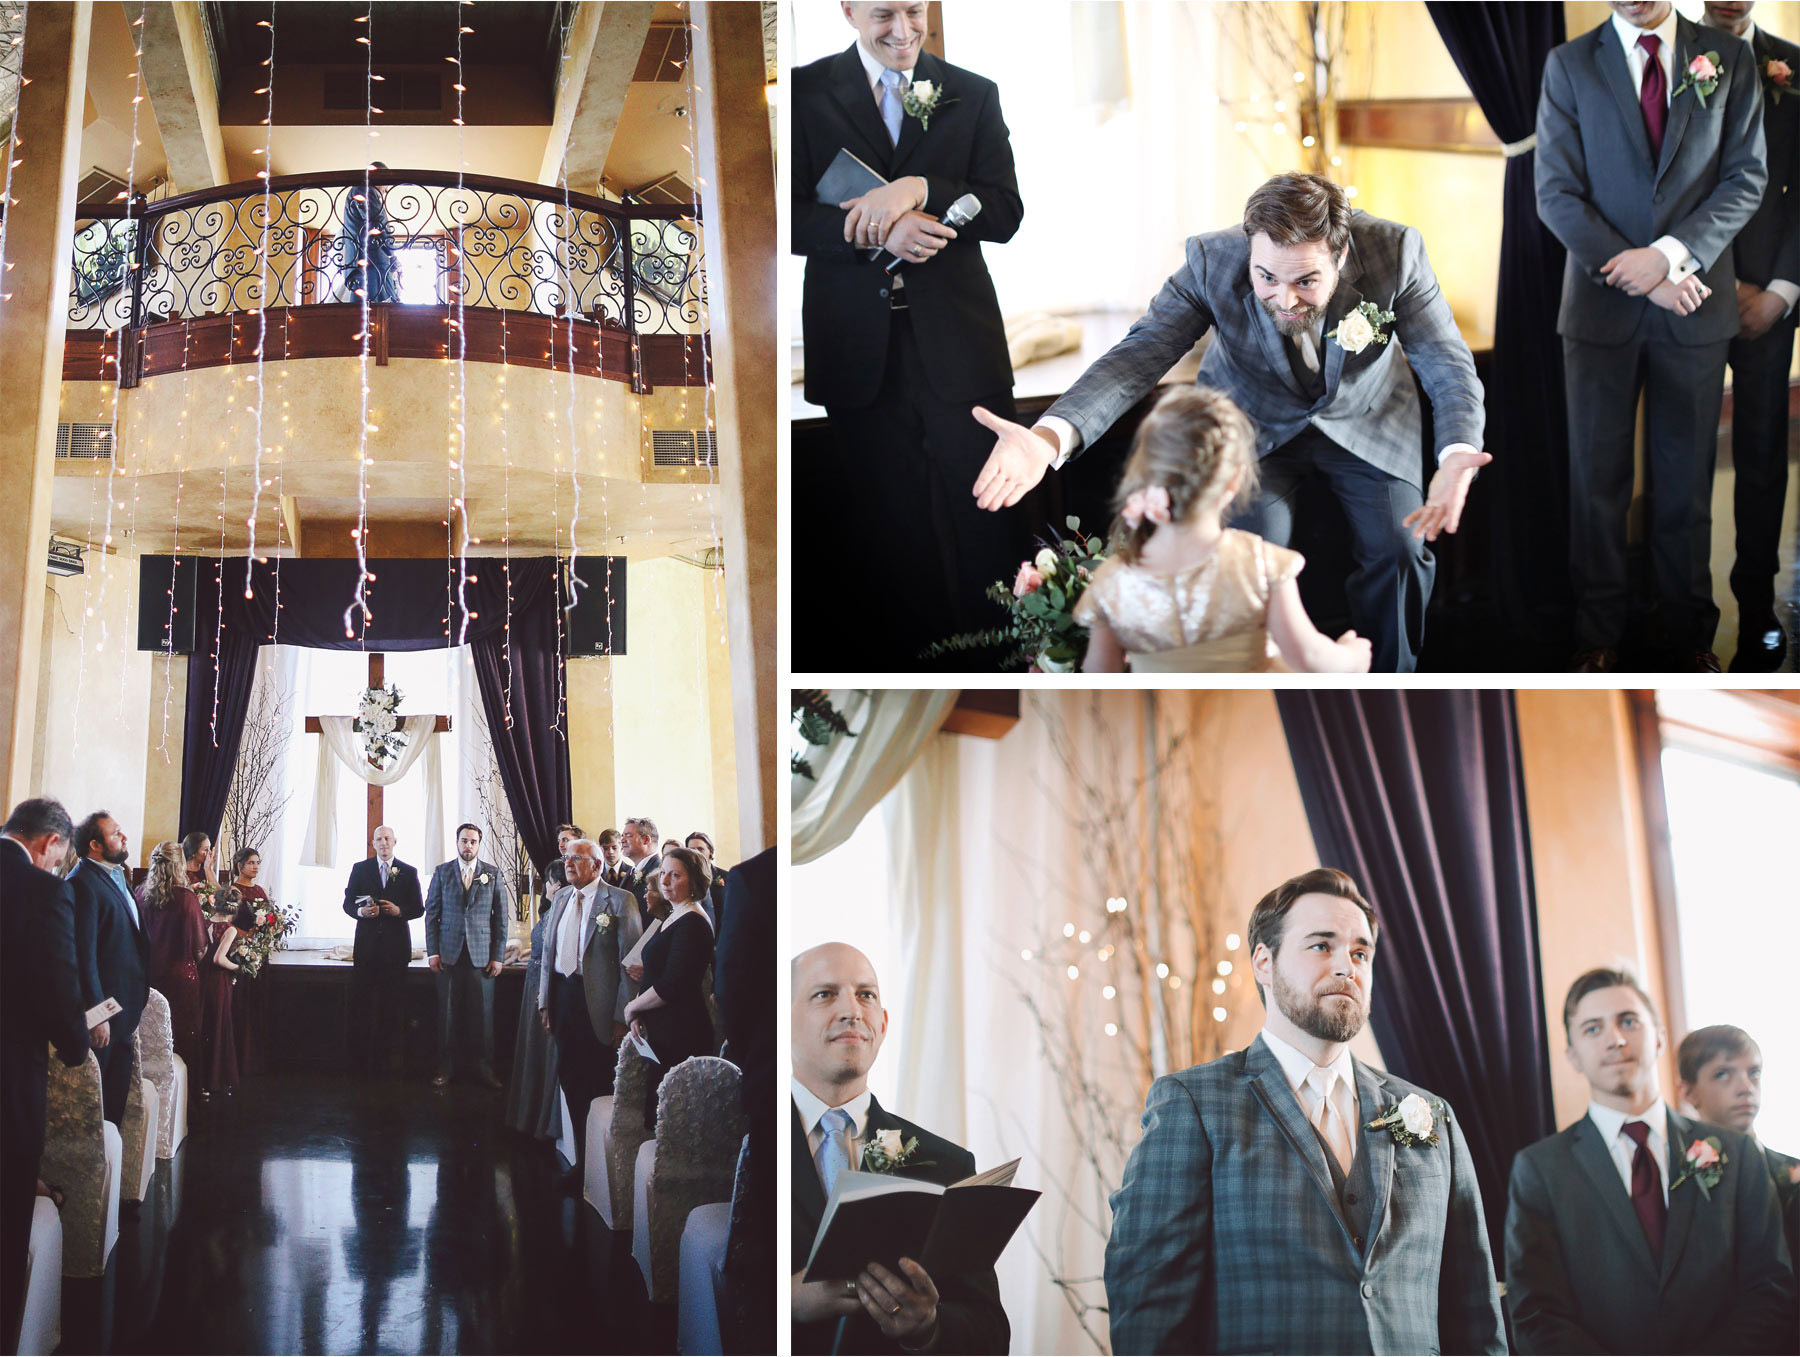 09-Minneapolis-Wedding-Photography-by-Vick-Photography-Historic-Concord-Exchange-Ceremony-Rachael-and-Benjamin.jpg